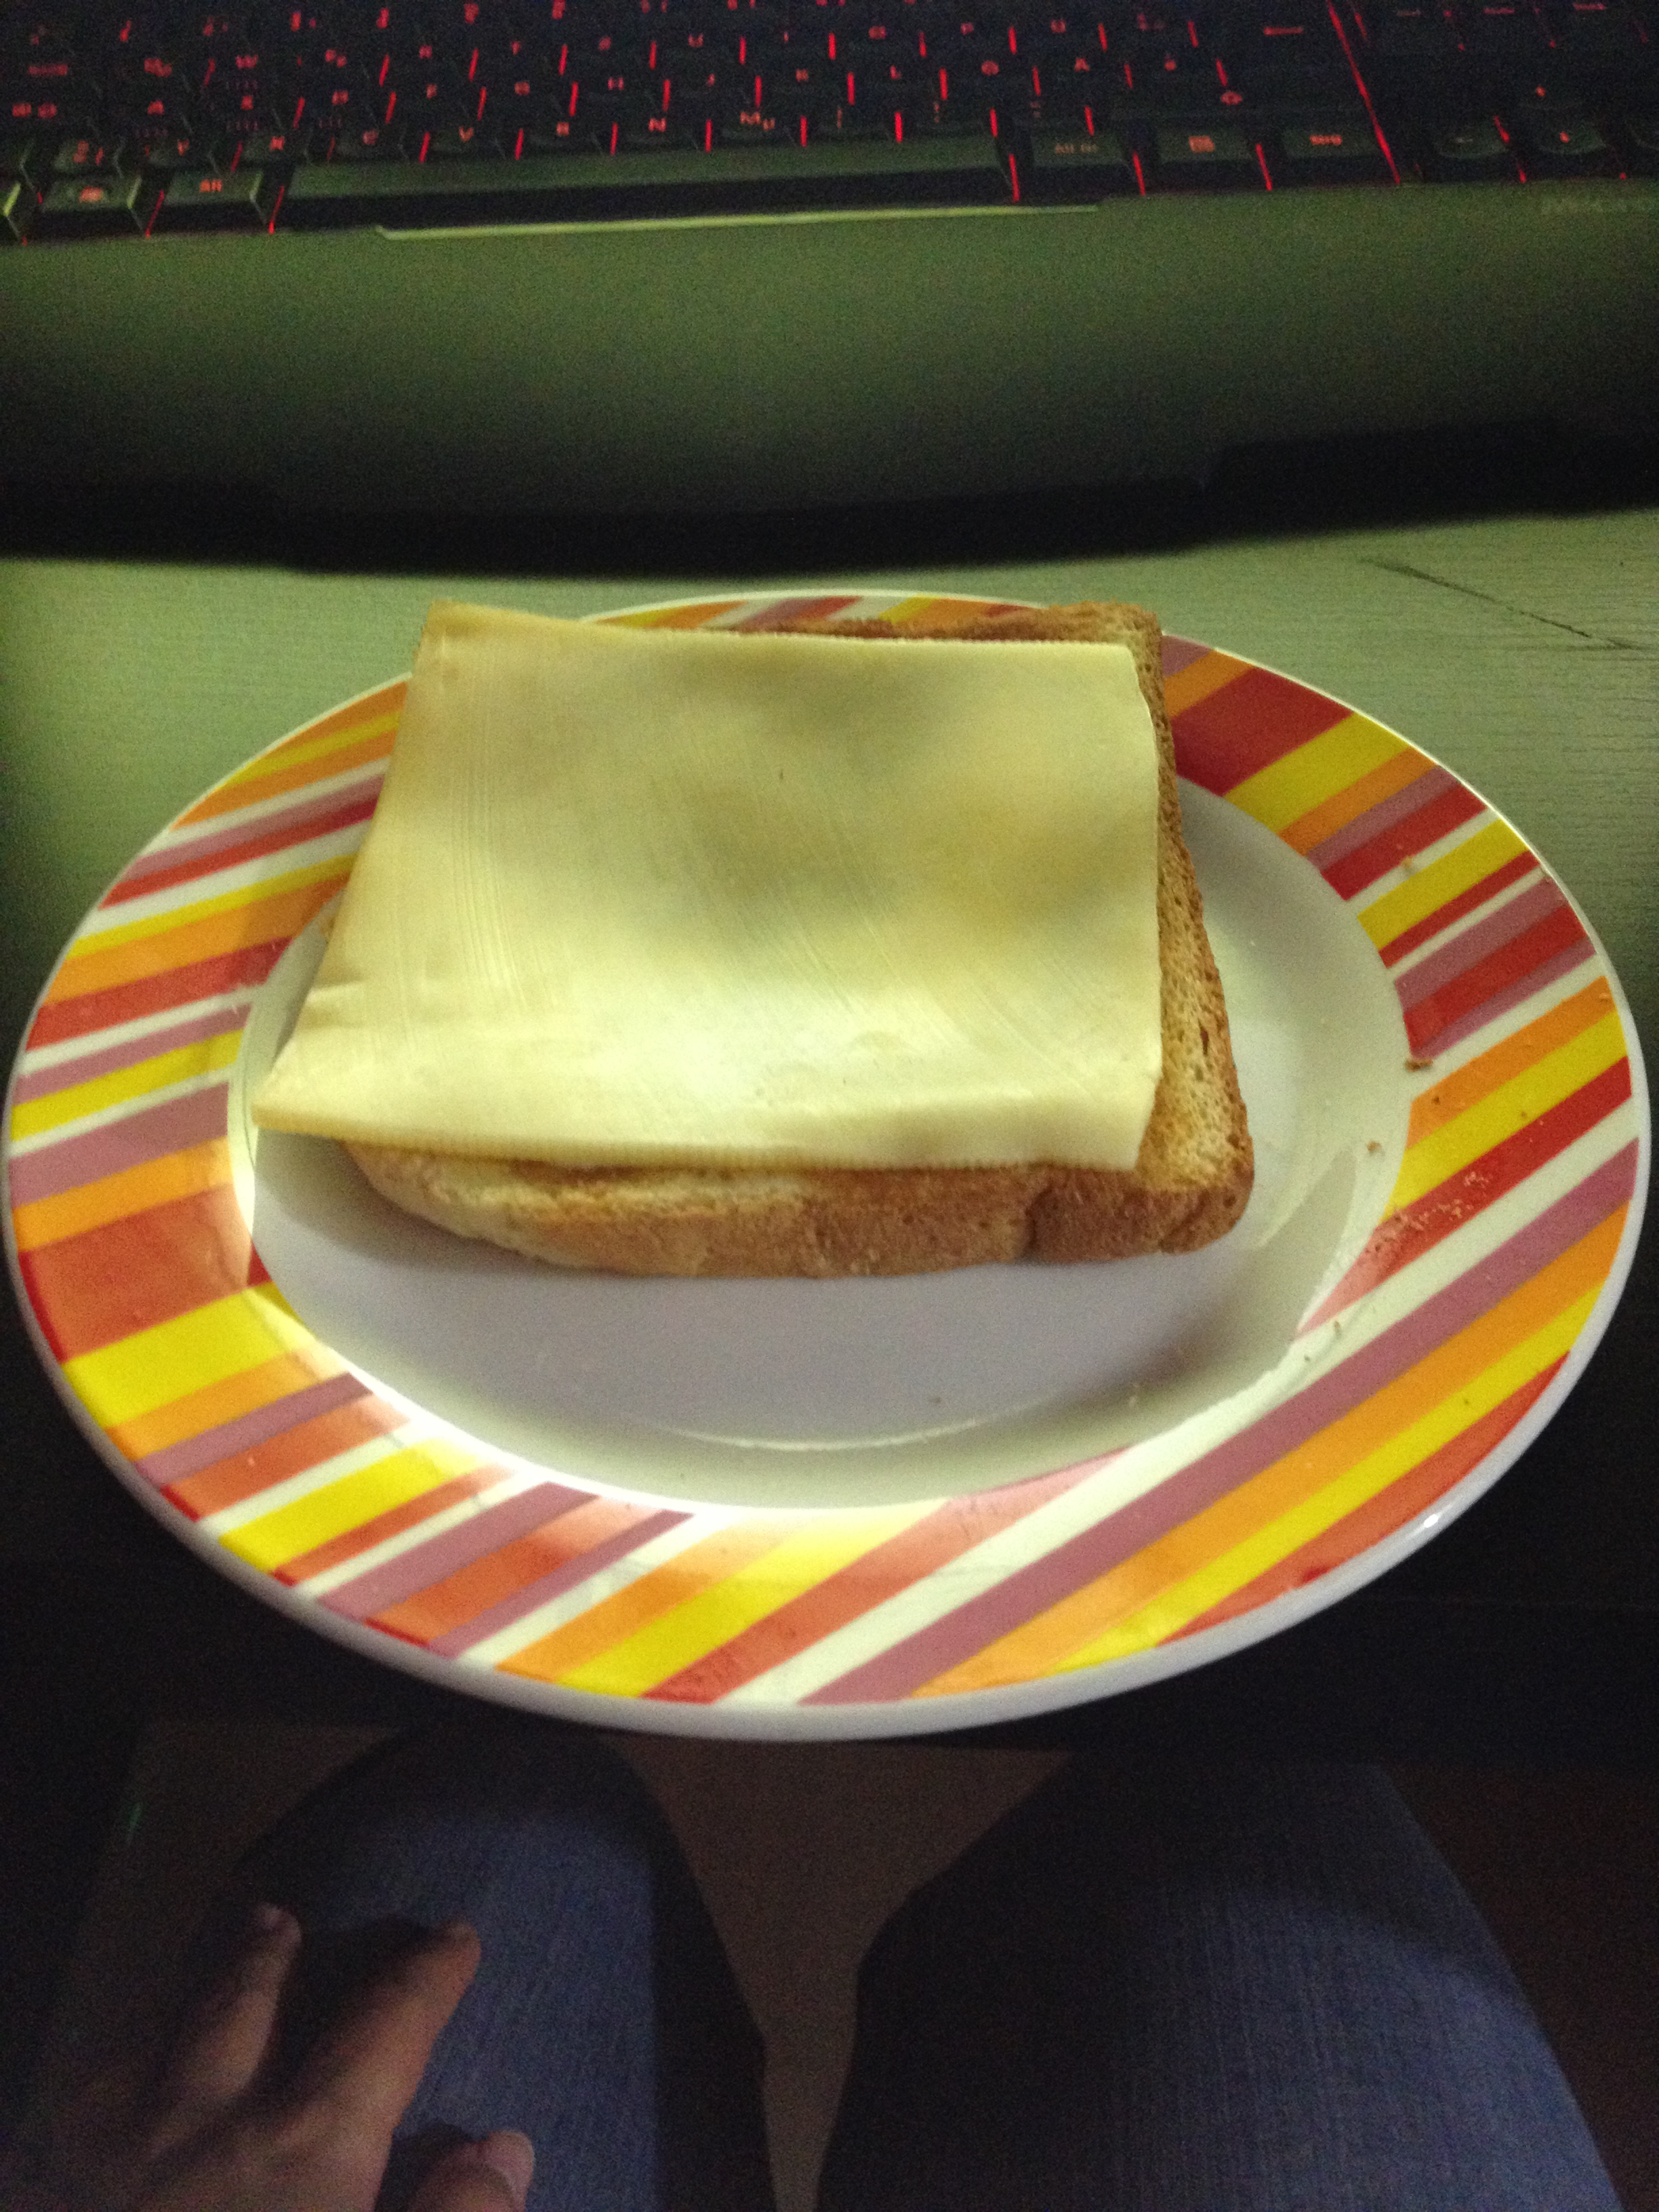 http://foodloader.net/kug_2012-11-05_pre_dentist_toast.jpg